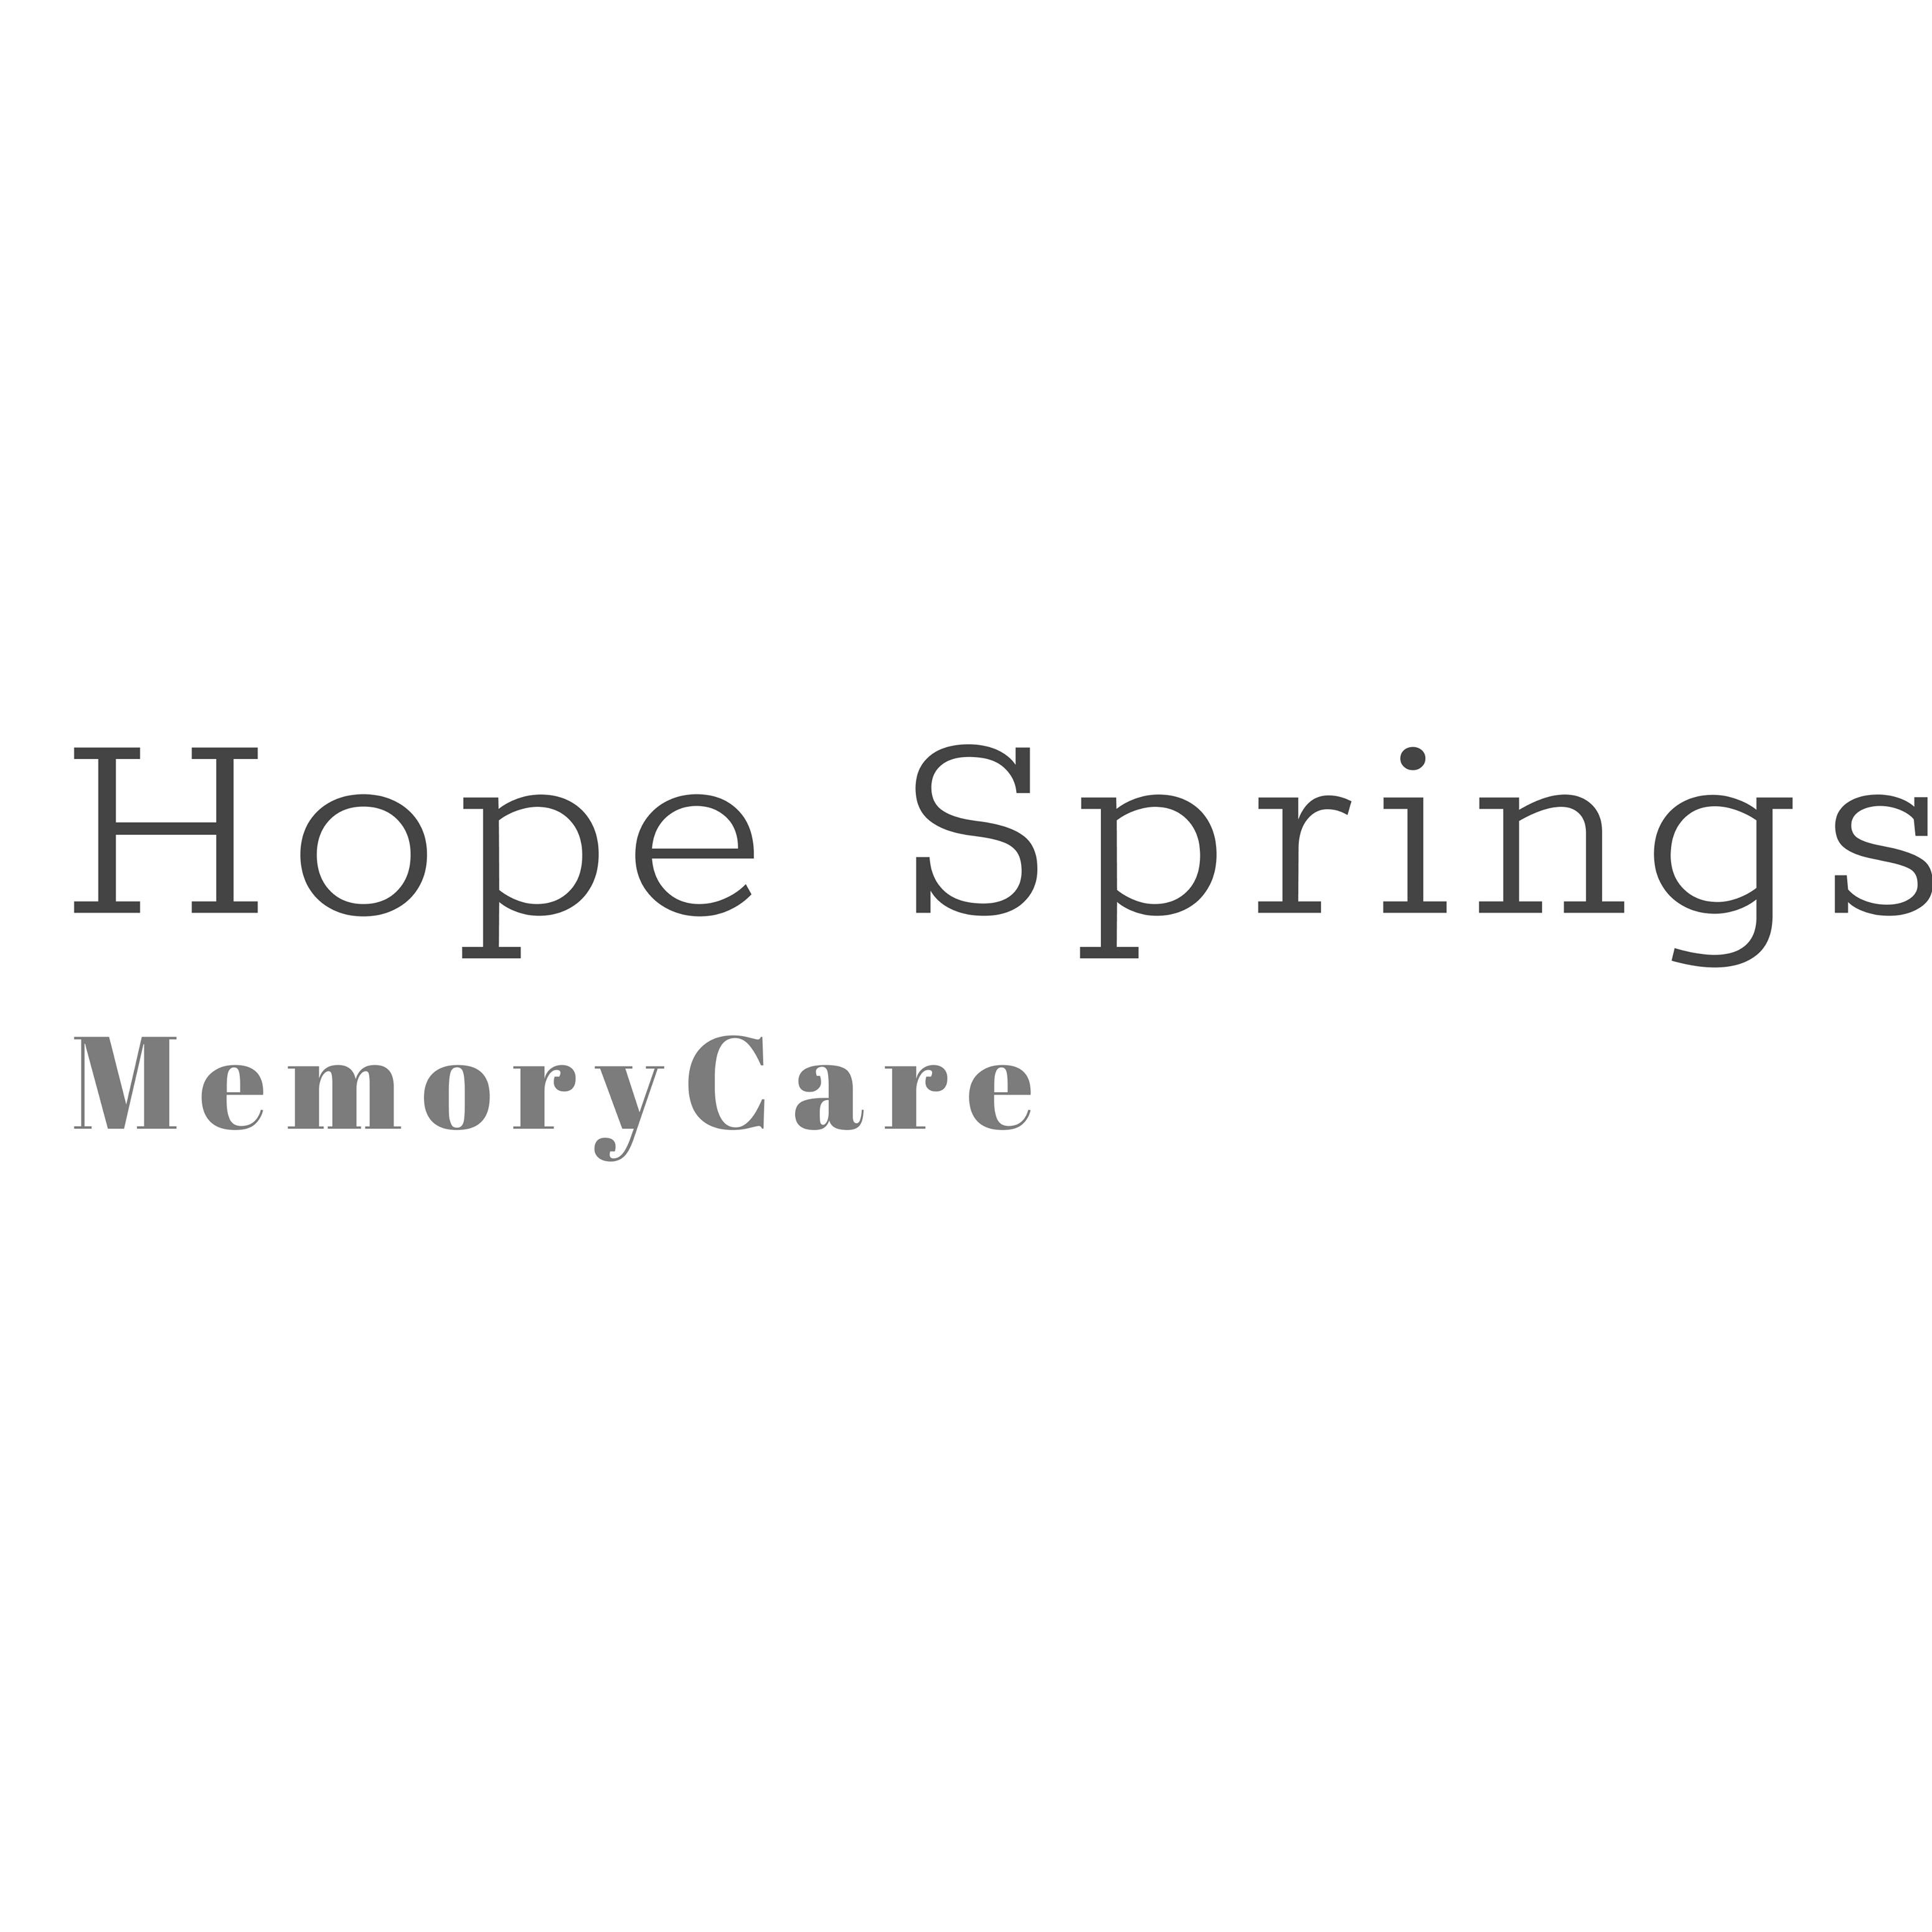 Hope Springs Memory Care image 3